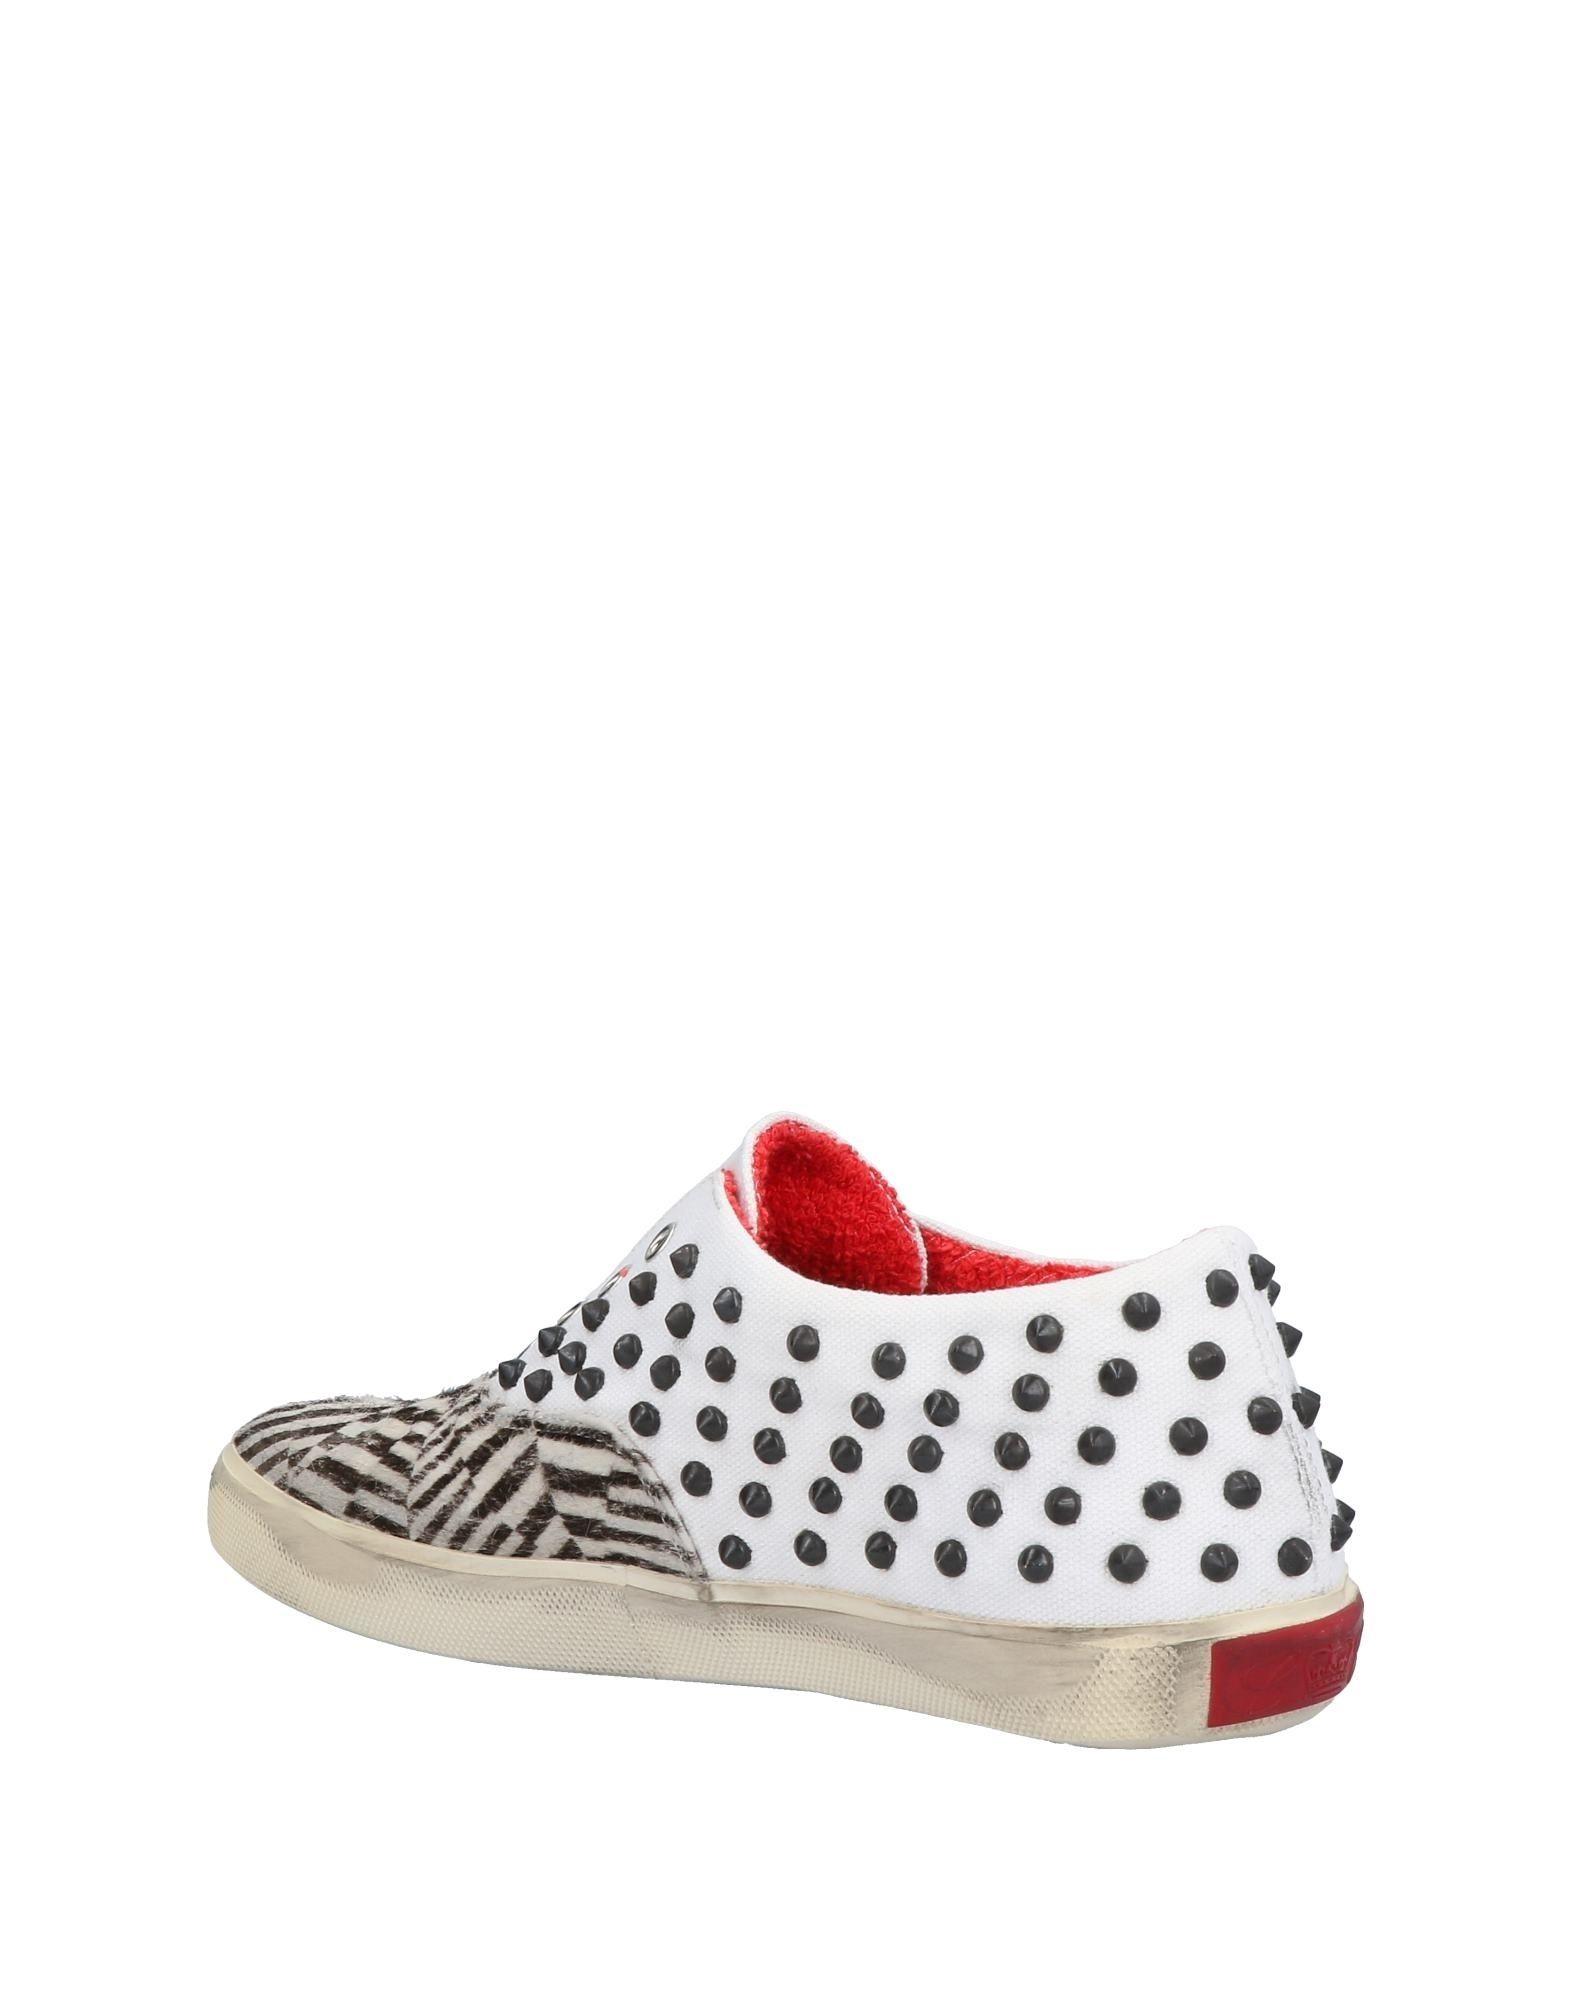 Gut Crown um billige Schuhe zu tragenLeather Crown Gut Sneakers Damen  11461006BD 6e372d